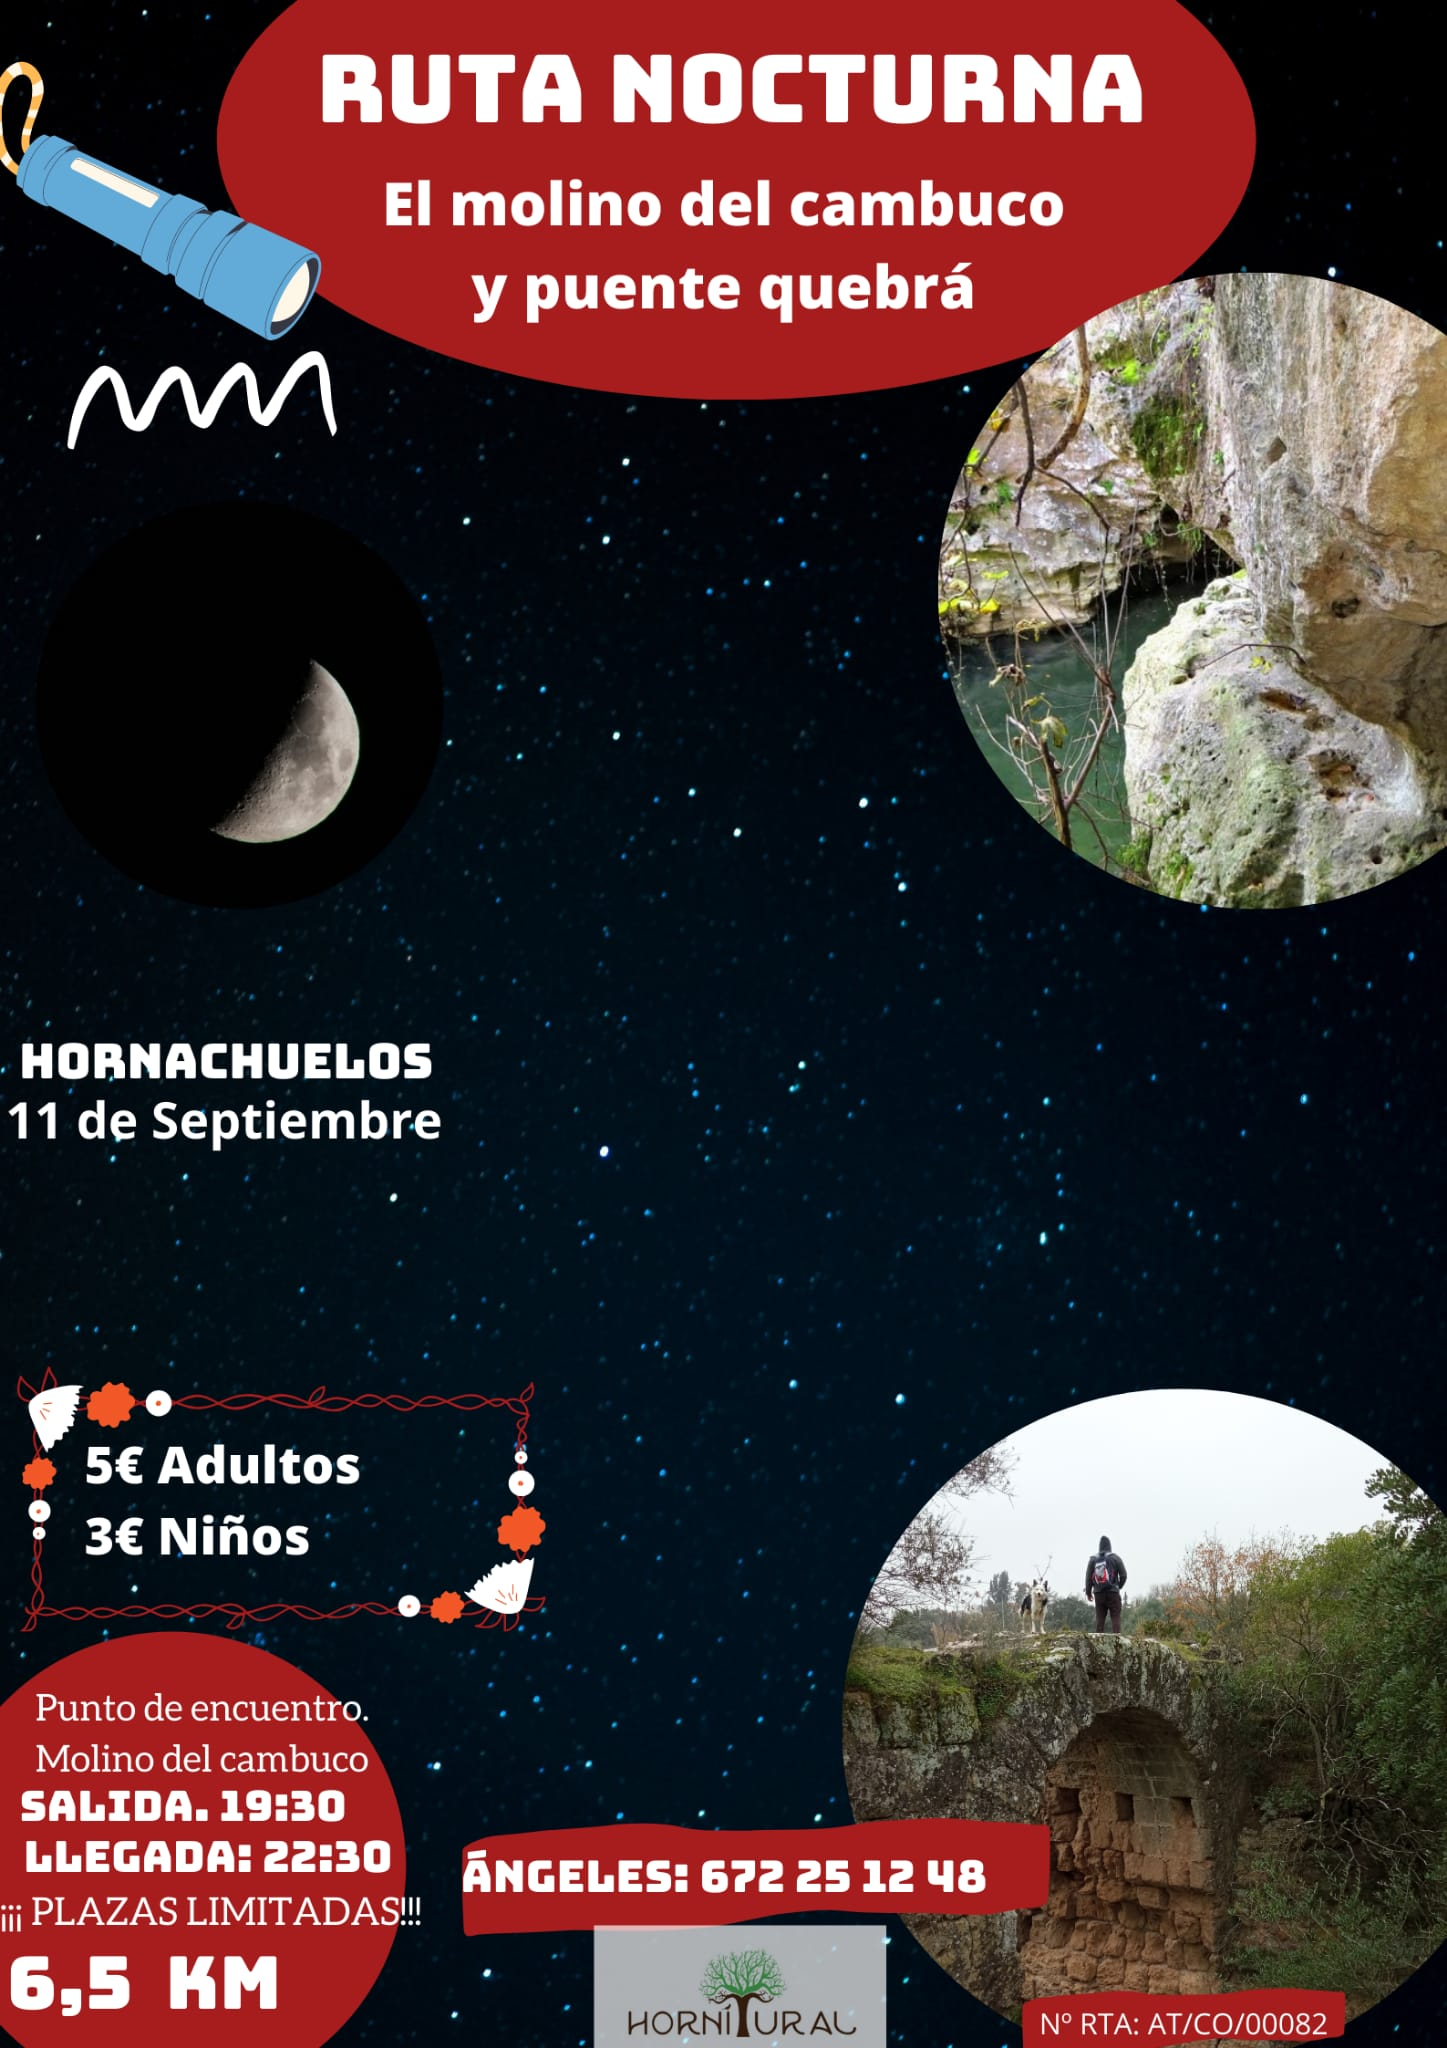 Ruta Nocturna Hornitural-Molino del Cambuco